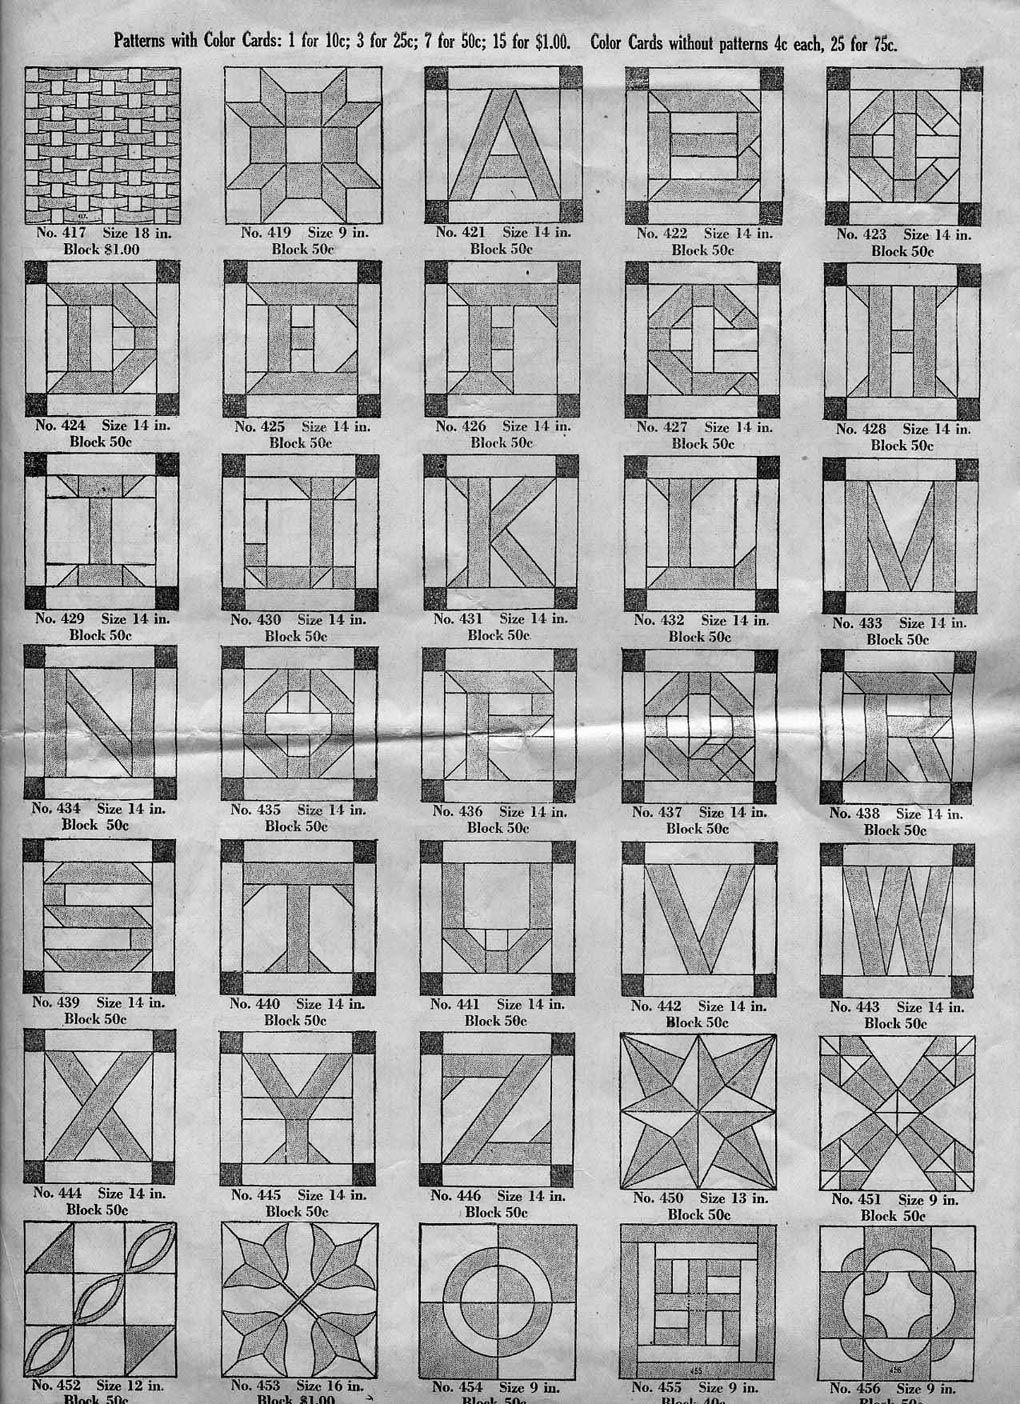 Ladies Art Company Quilt Pattern - 1922 | DIY & crafts | Pinterest ...